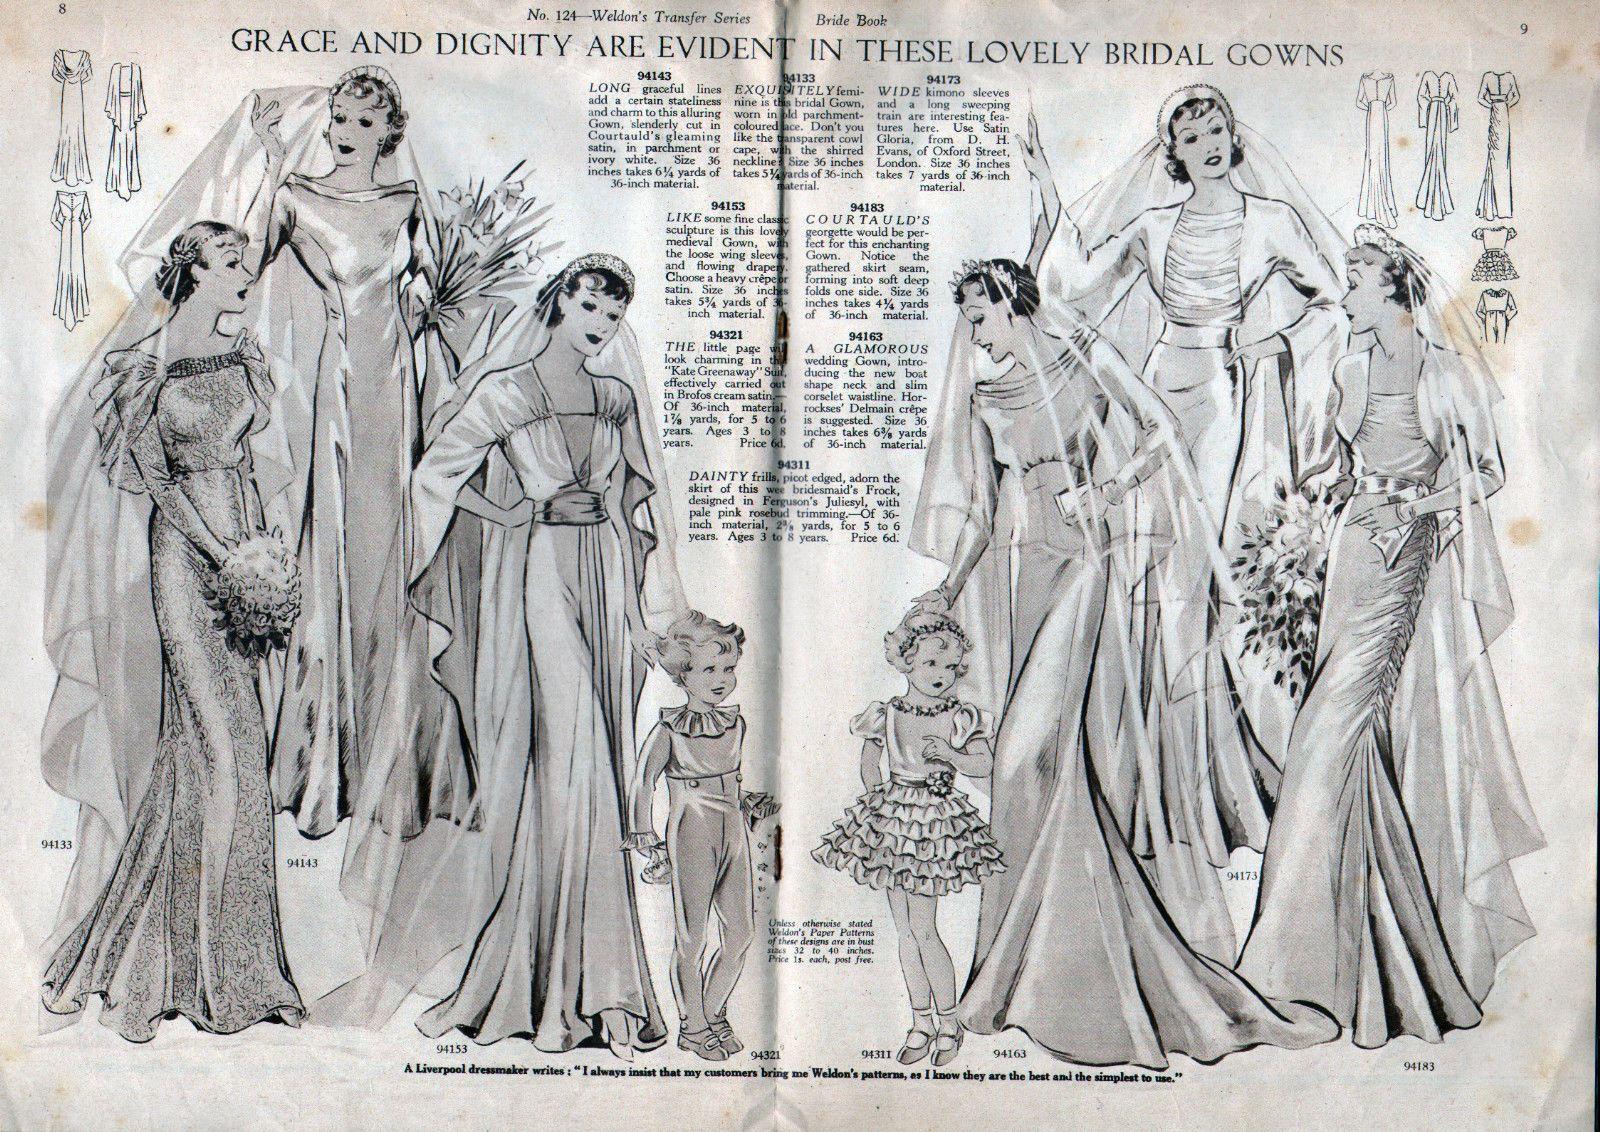 Free wedding dress catalogs  Rare us WELDONuS Brideus Book Catalog  Two Wedding Dress